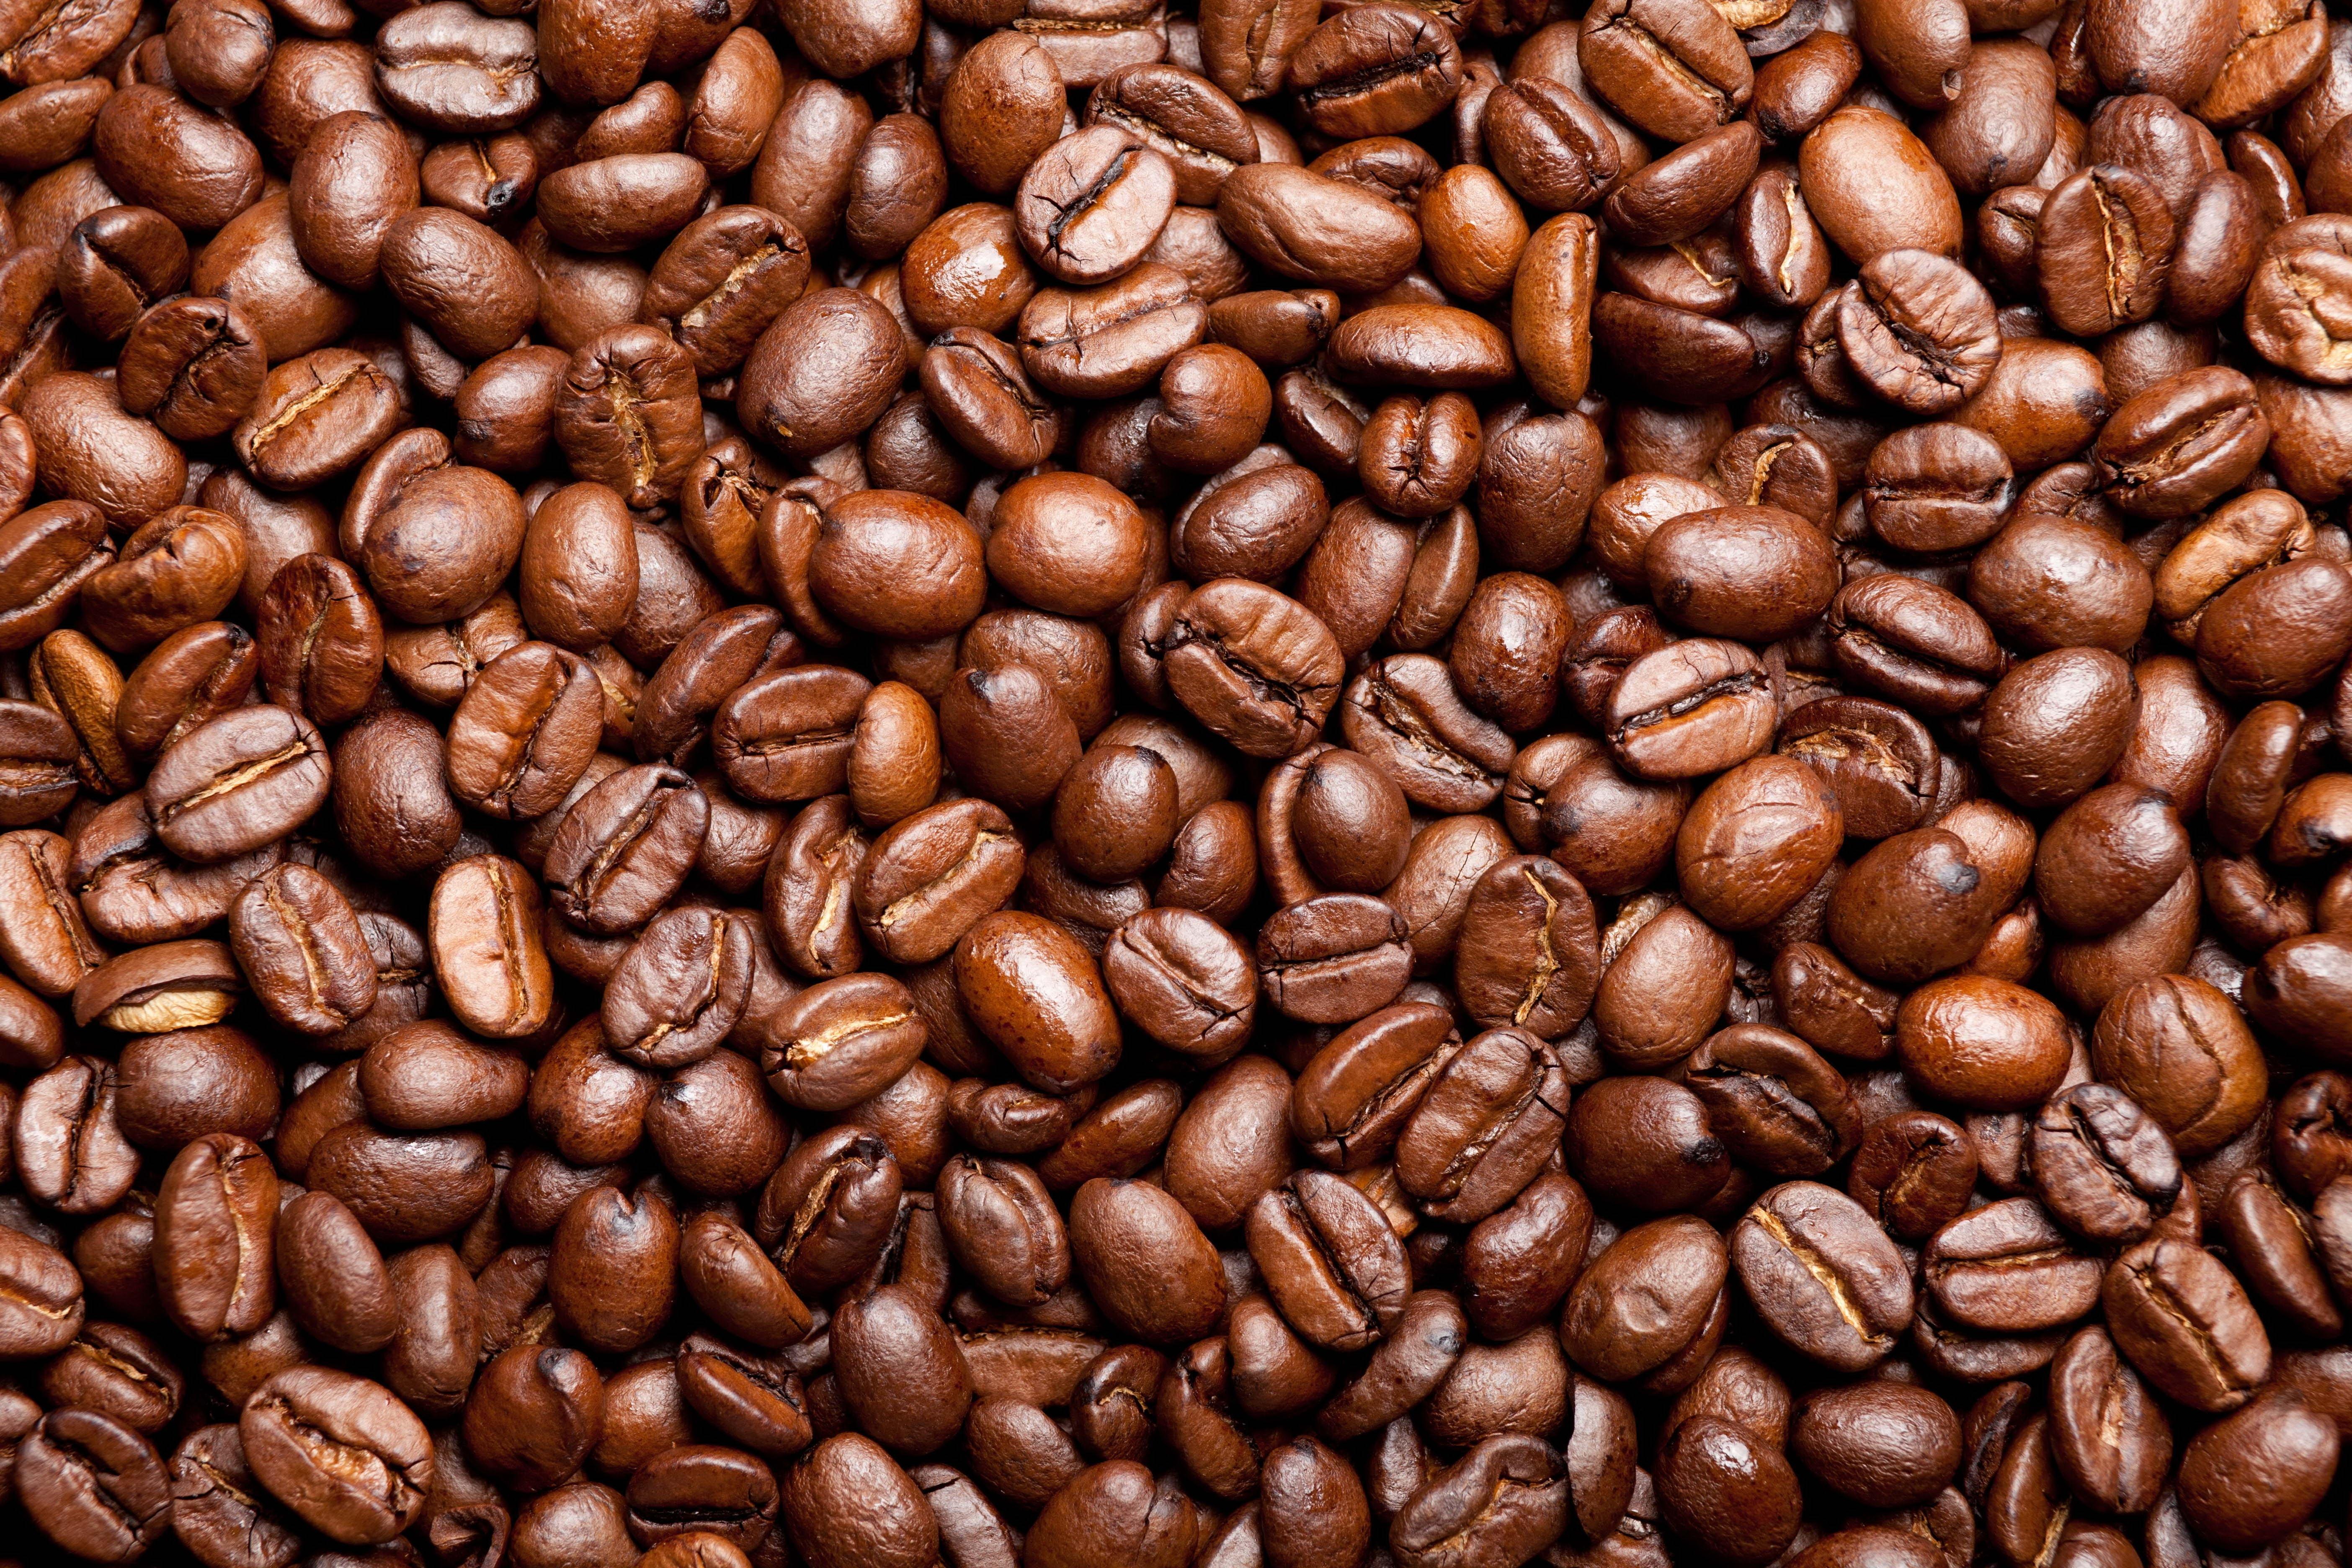 Brown coffee beans HD wallpaper | Wallpaper Flare